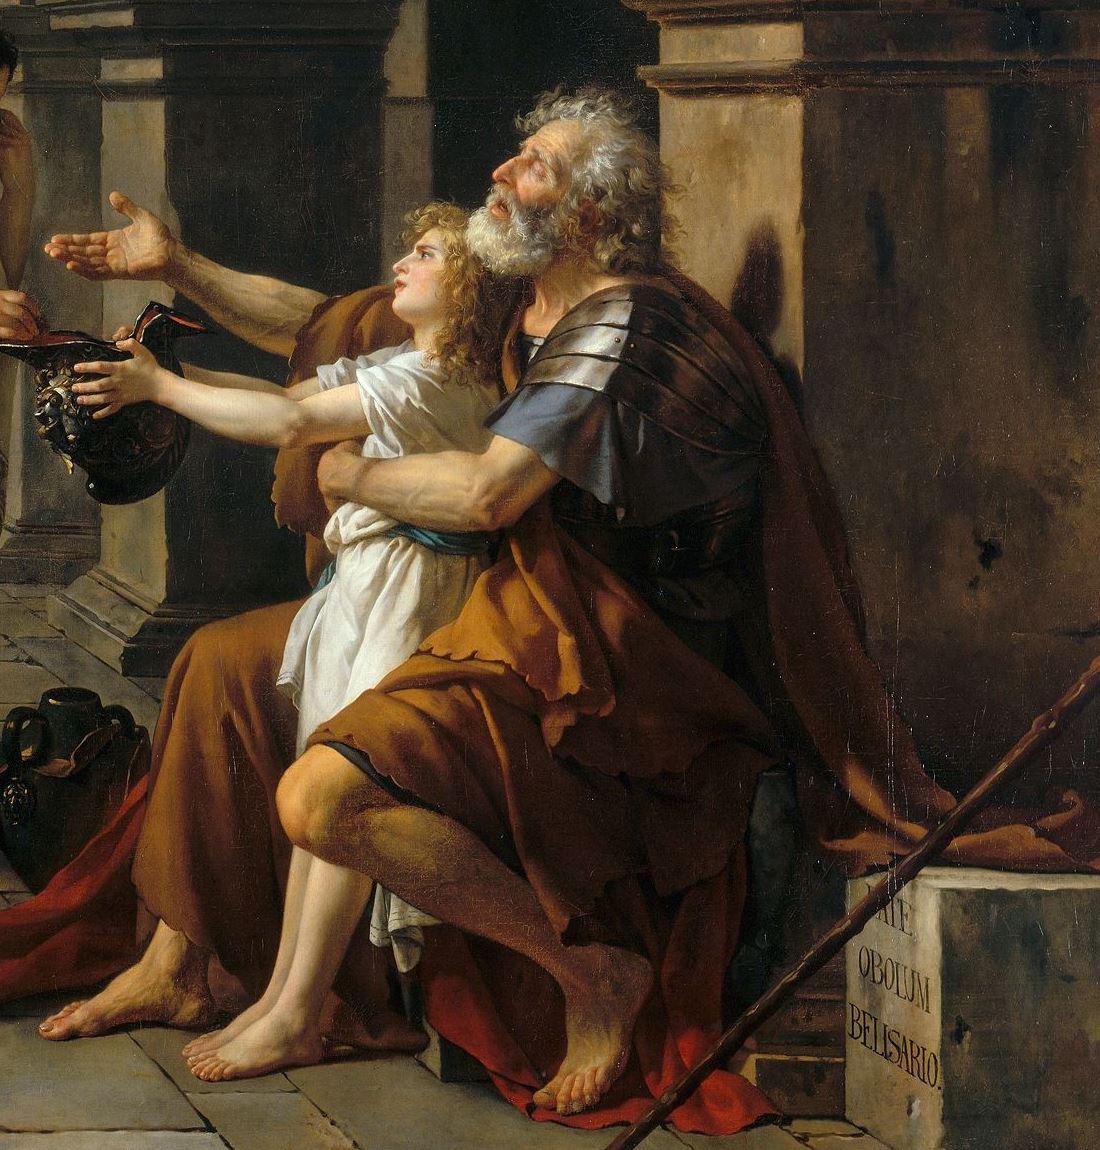 Jacques-Louis David. Belisarius begging. Fragment